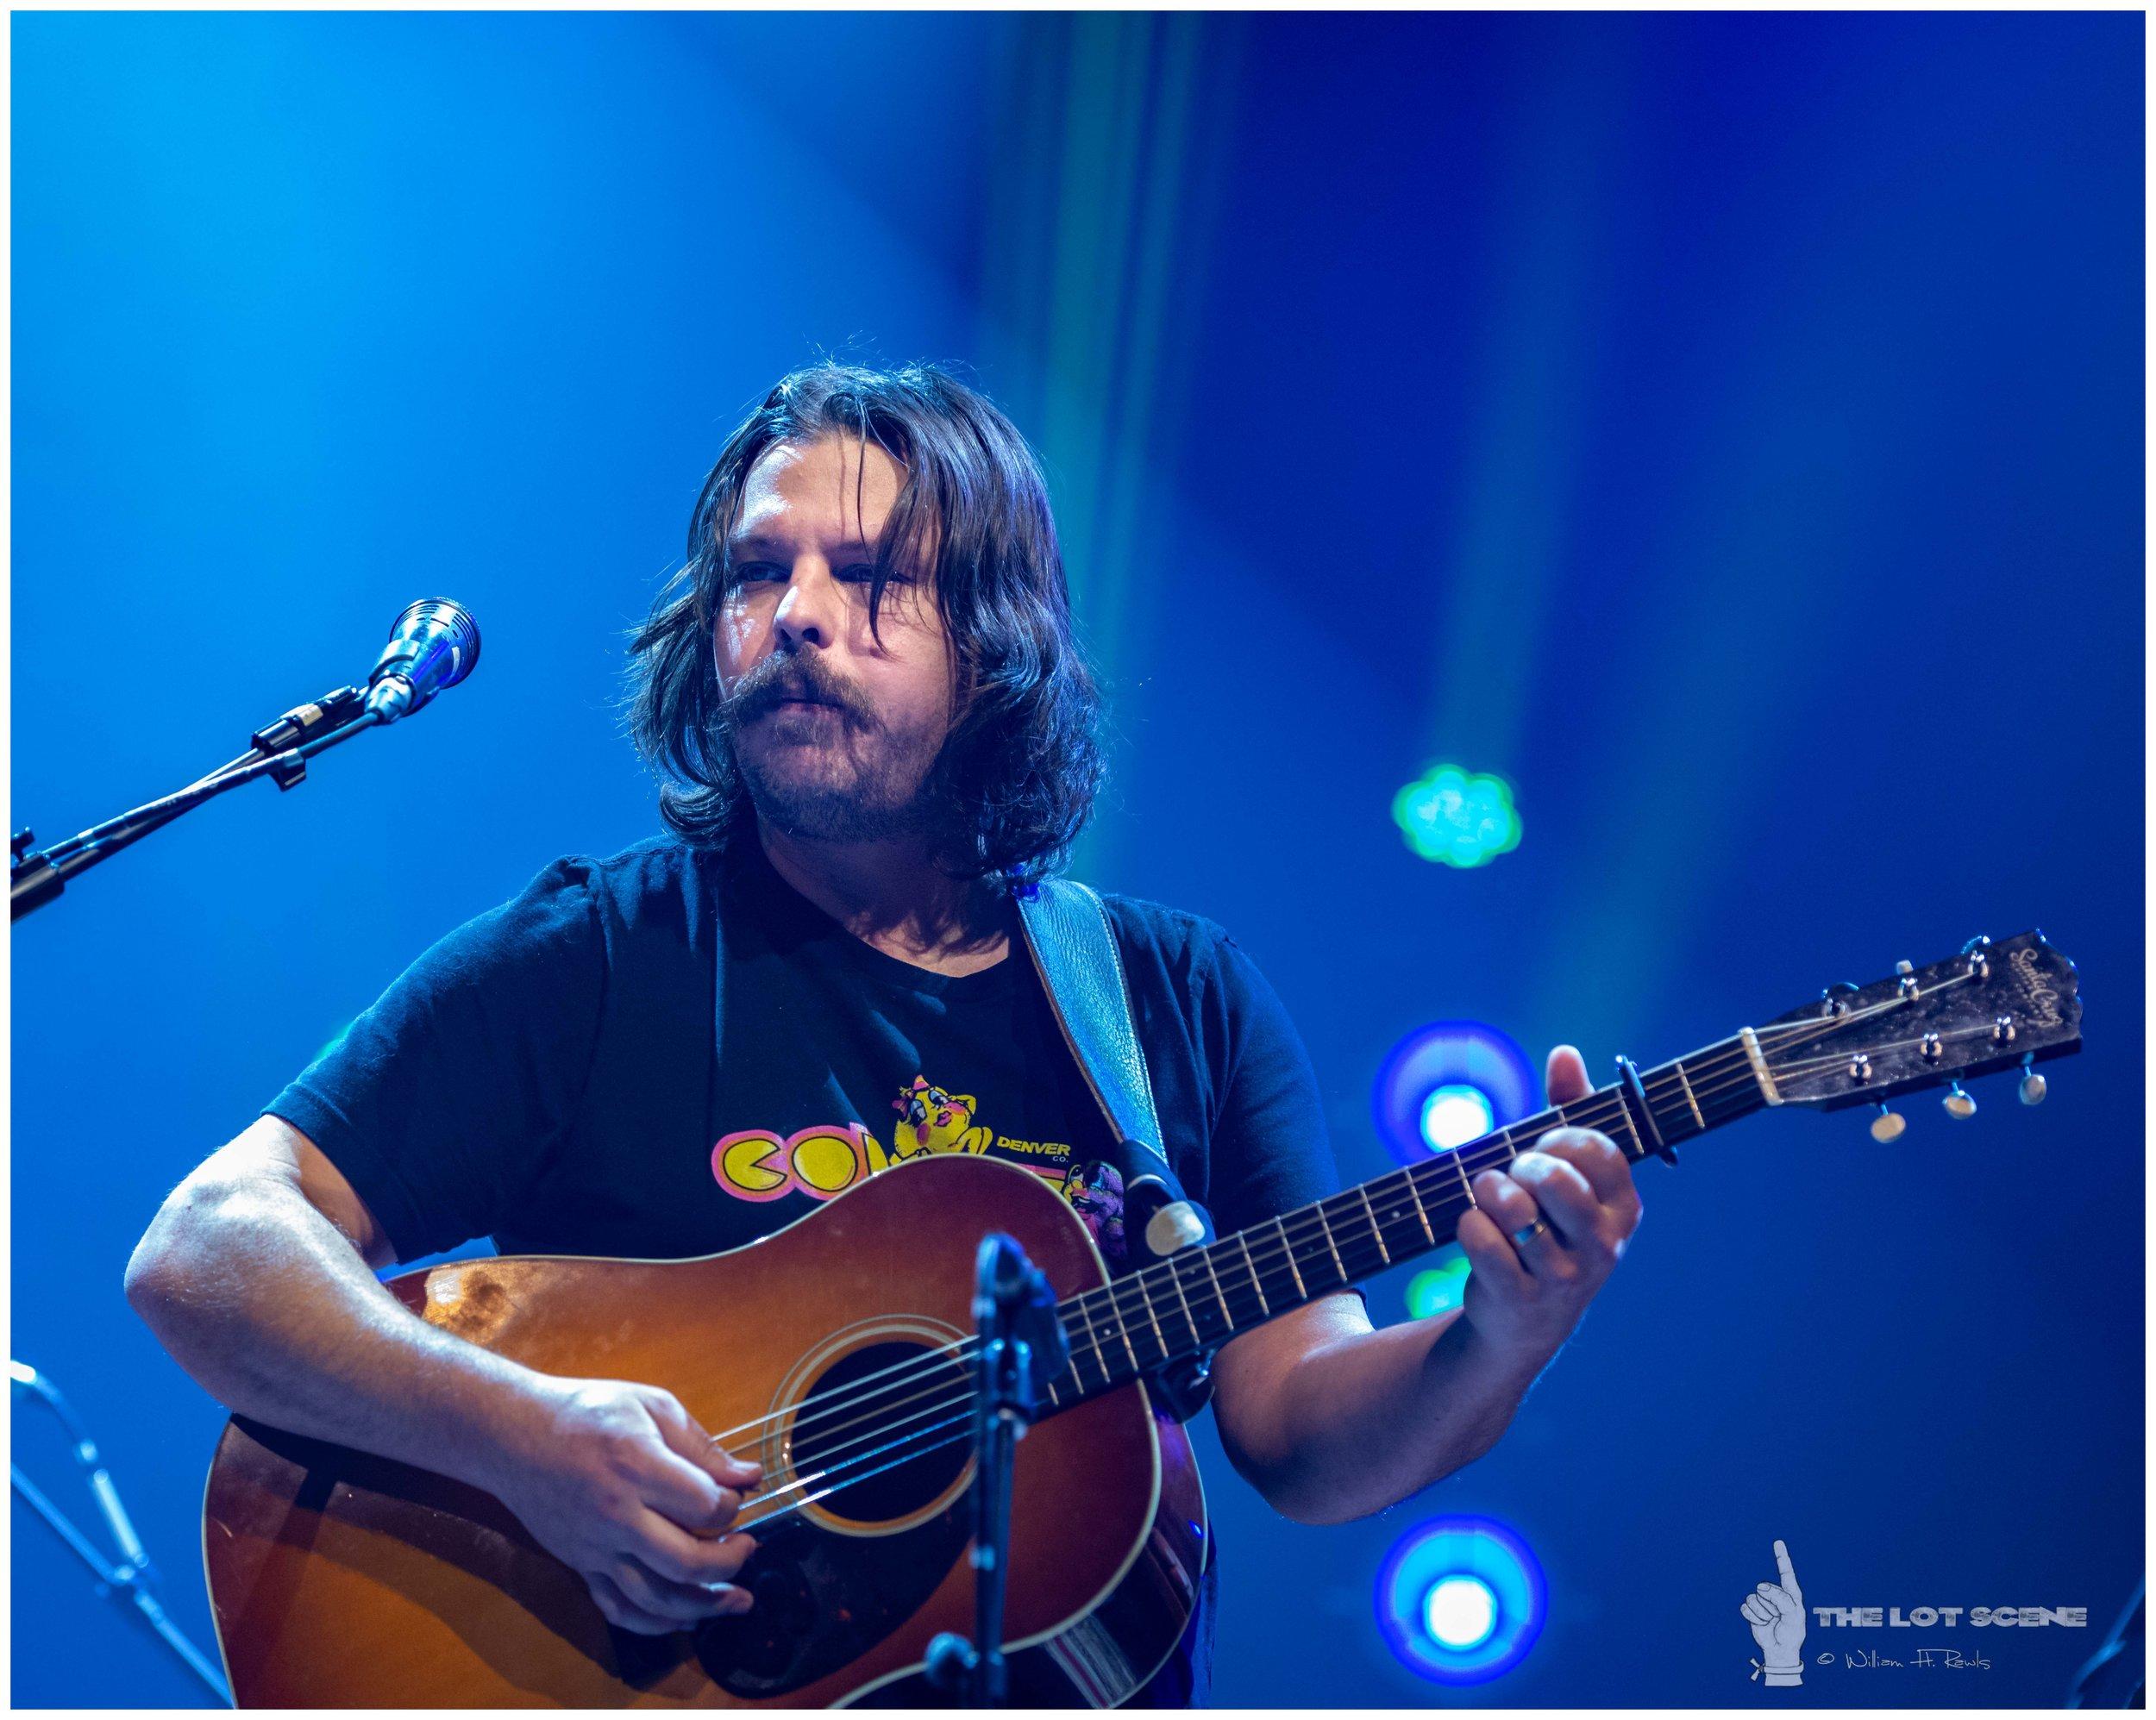 Greensky Bluegrass at The Anthem DC - February 2 2019 - 6.jpg